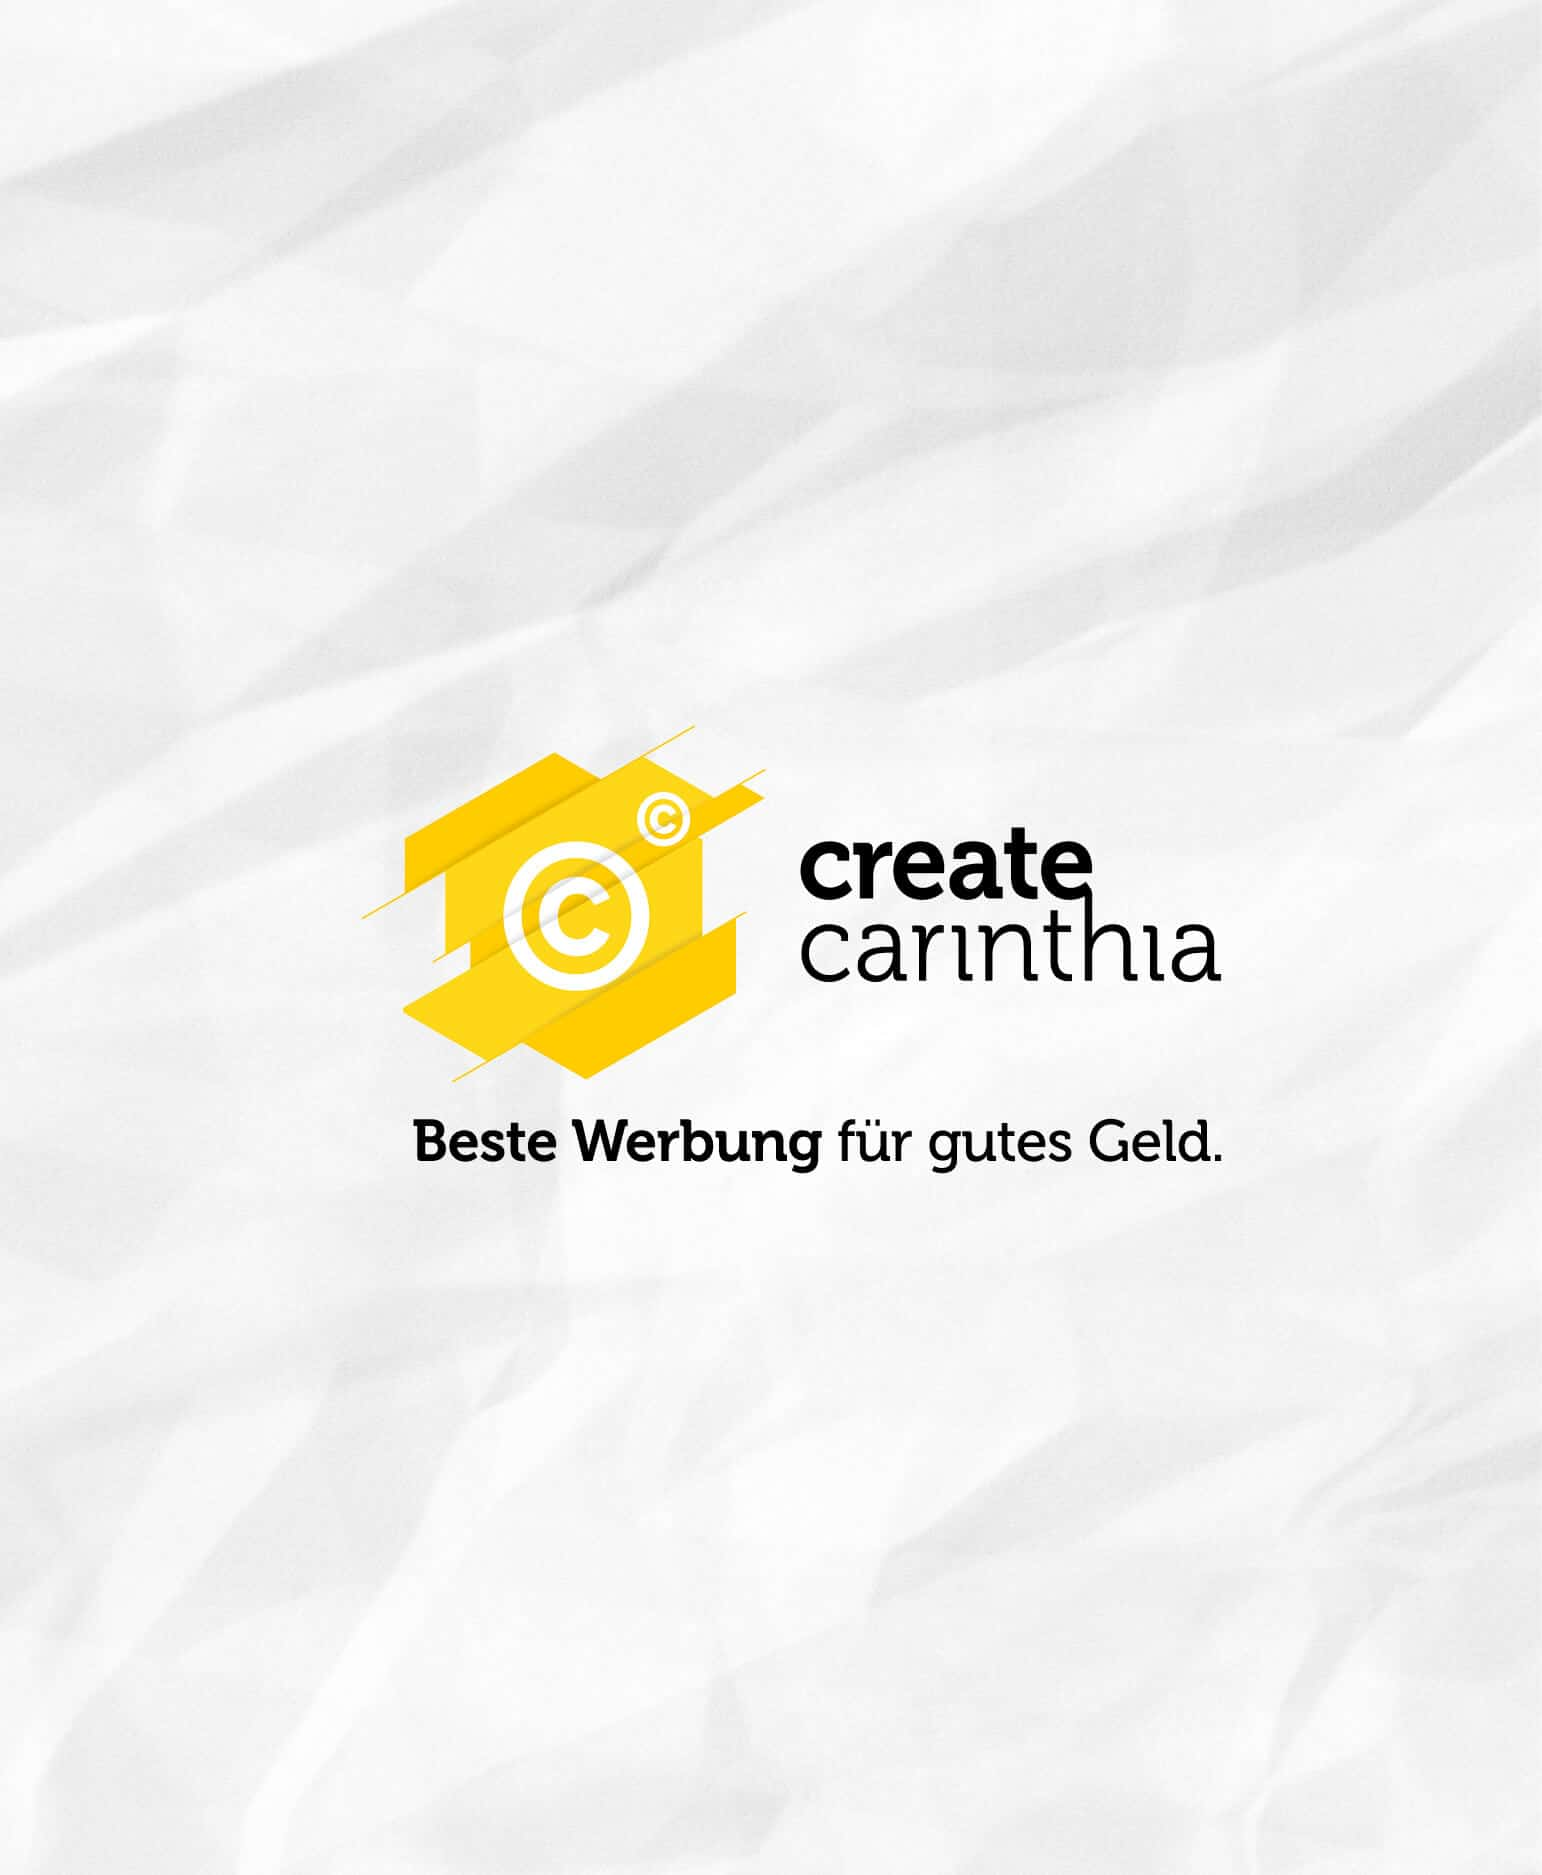 Create Carinthia